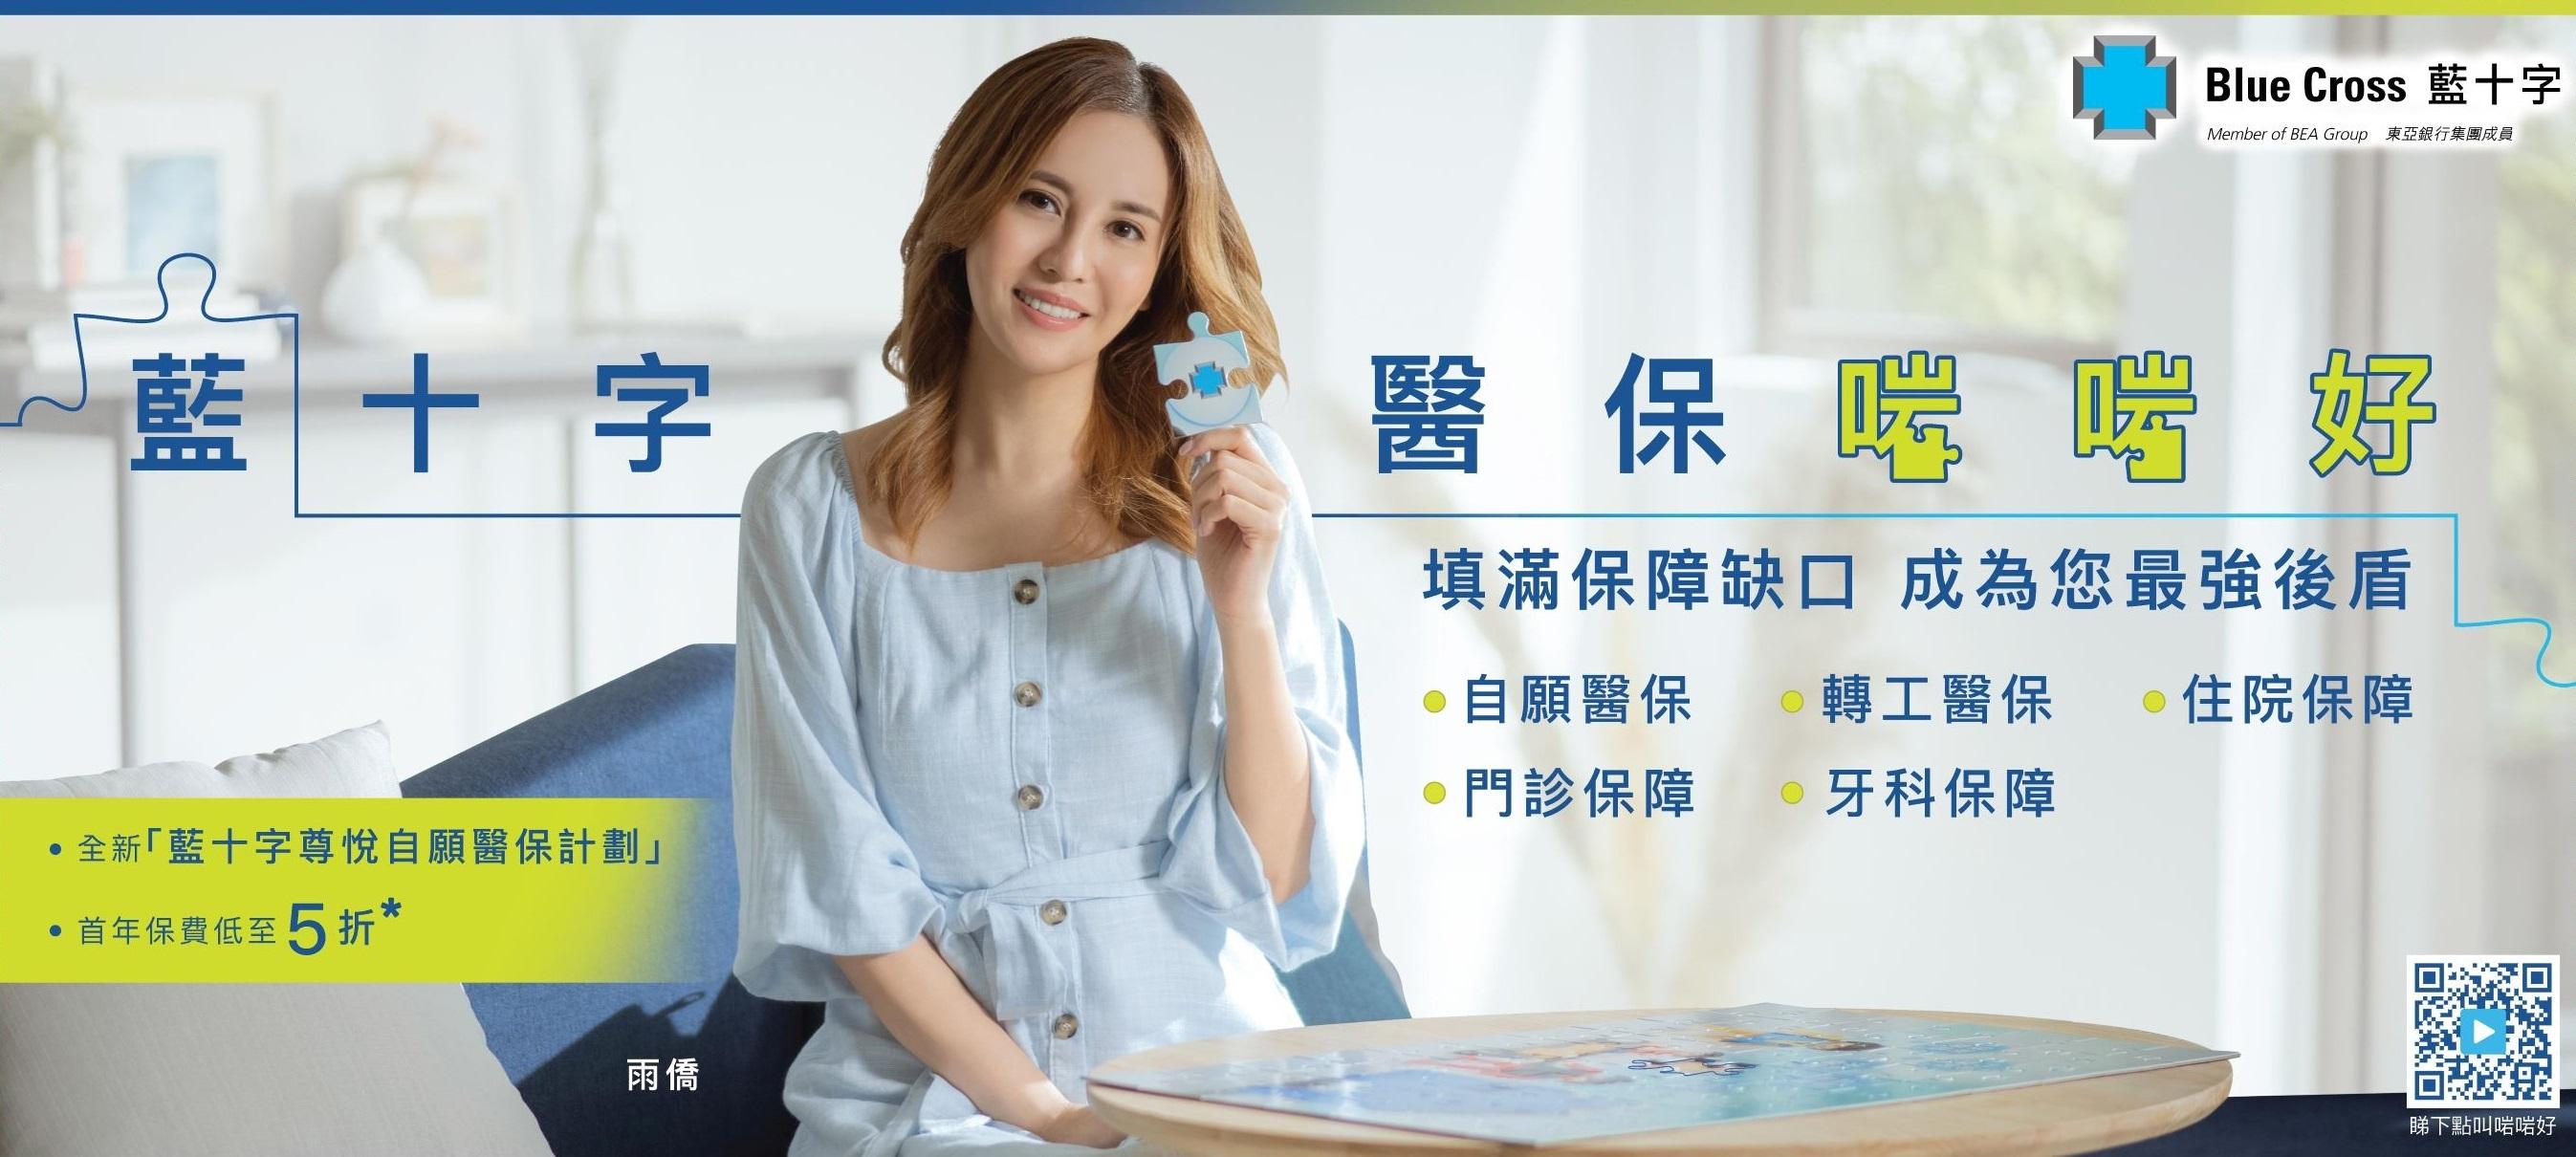 Blue Cross Dynasty VHIS Plan  Lifetime Benefit Limit up to HK48000000